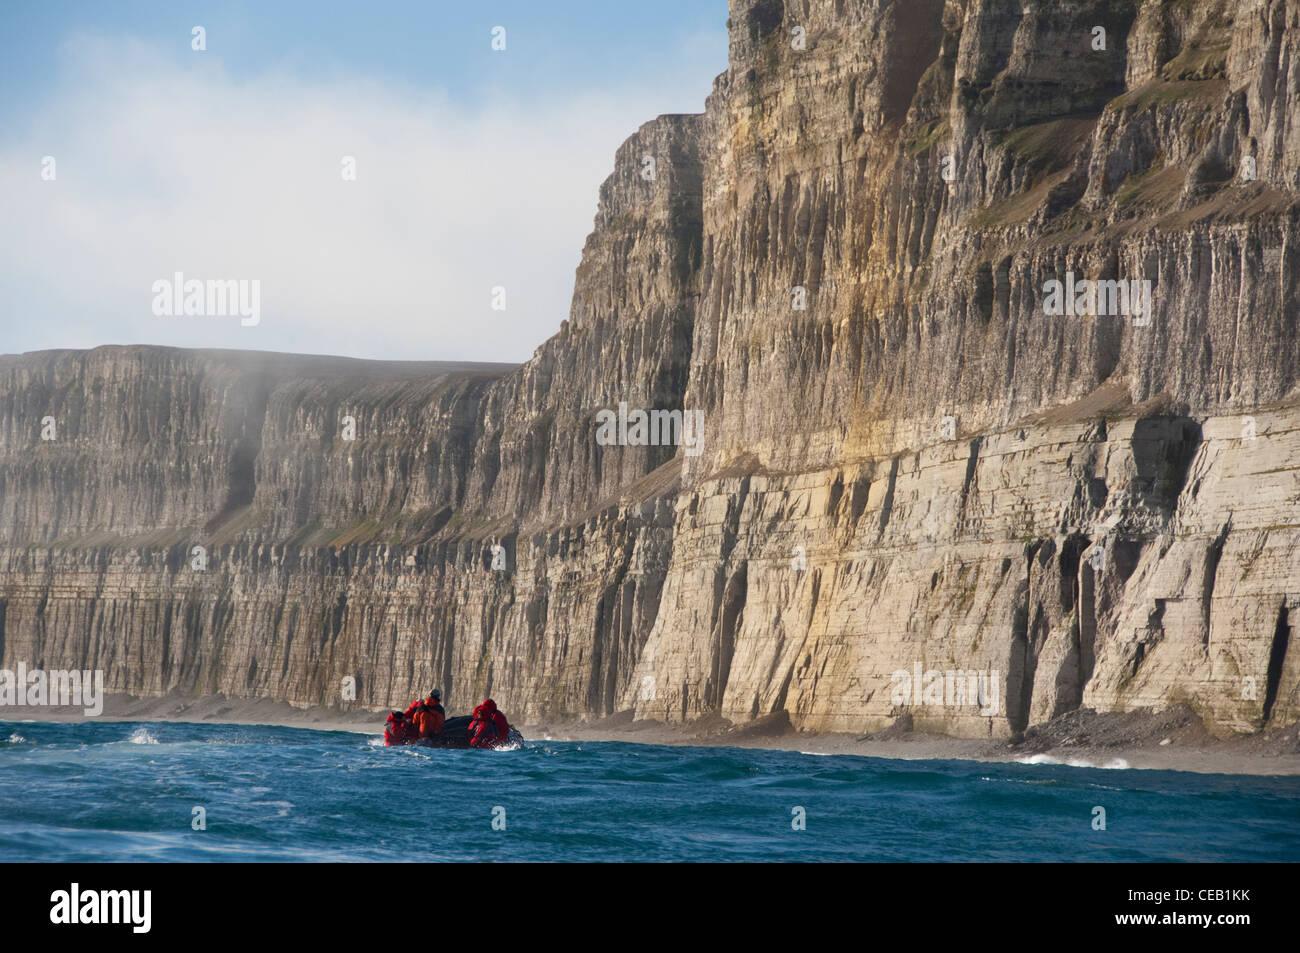 Canada, Nunavut, Qikiqtaaluk Region, Akpatok Island. Tourists in zodiac looking for stranded Polar bears. - Stock Image